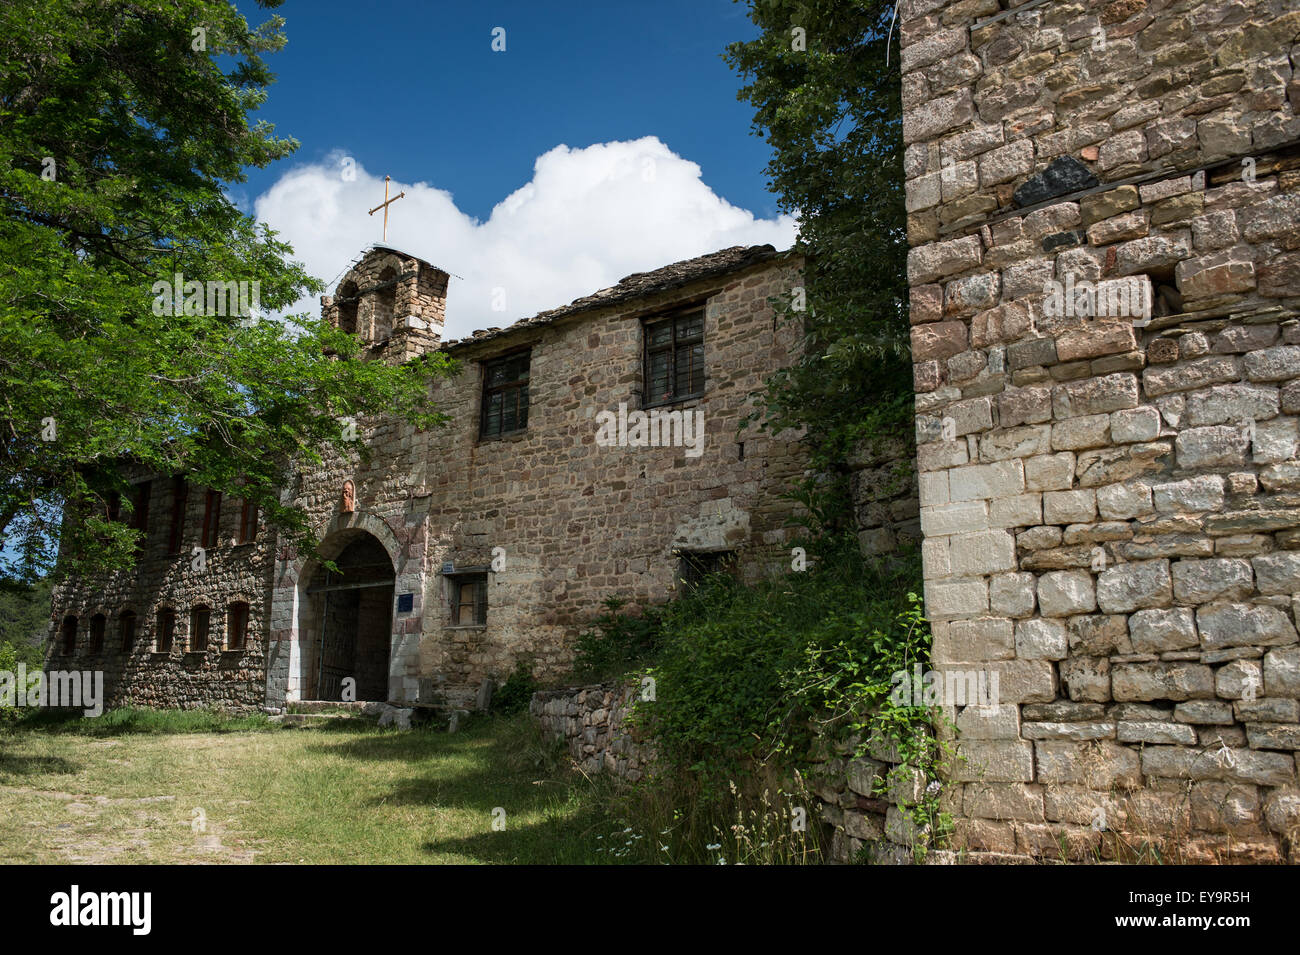 The Monastery of Saint John the Baptist (Shën Prodhome) in Voskopoja, Korke, Albania - Stock Image